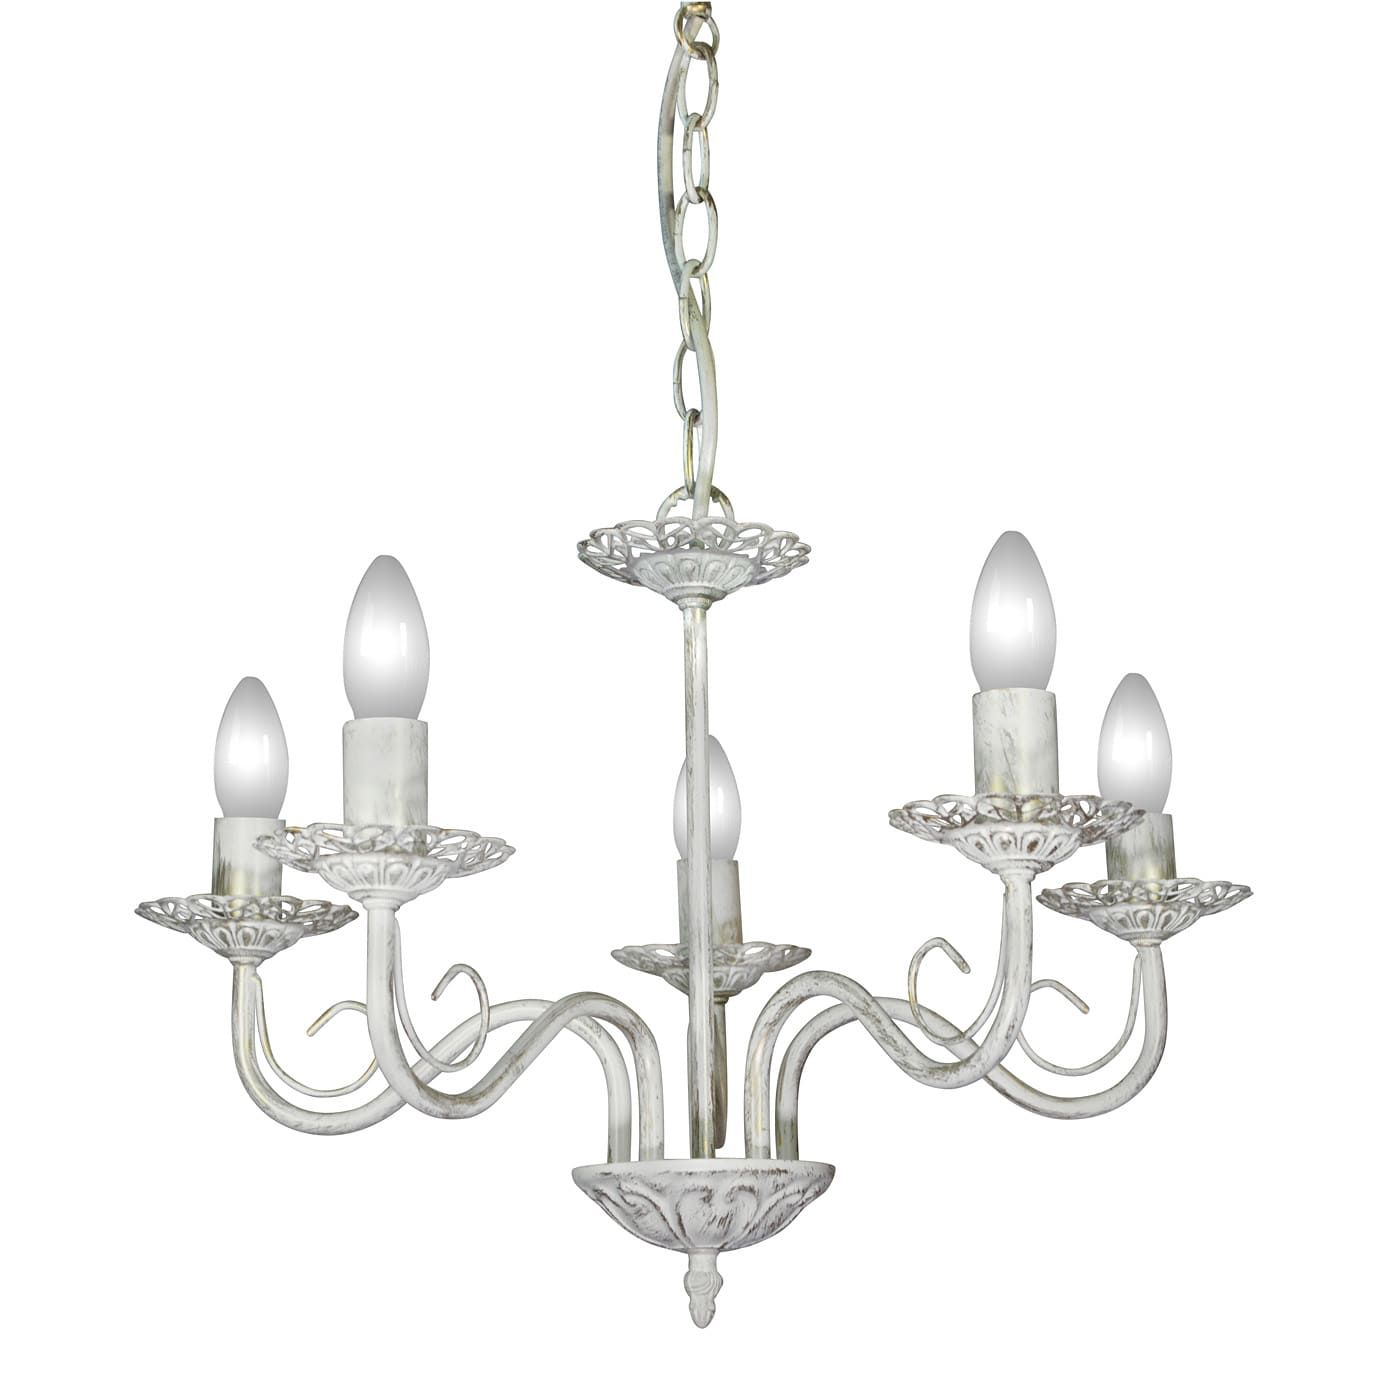 PETRASVET / Pendant chandelier S1158-5, 5xE14 max. 60W